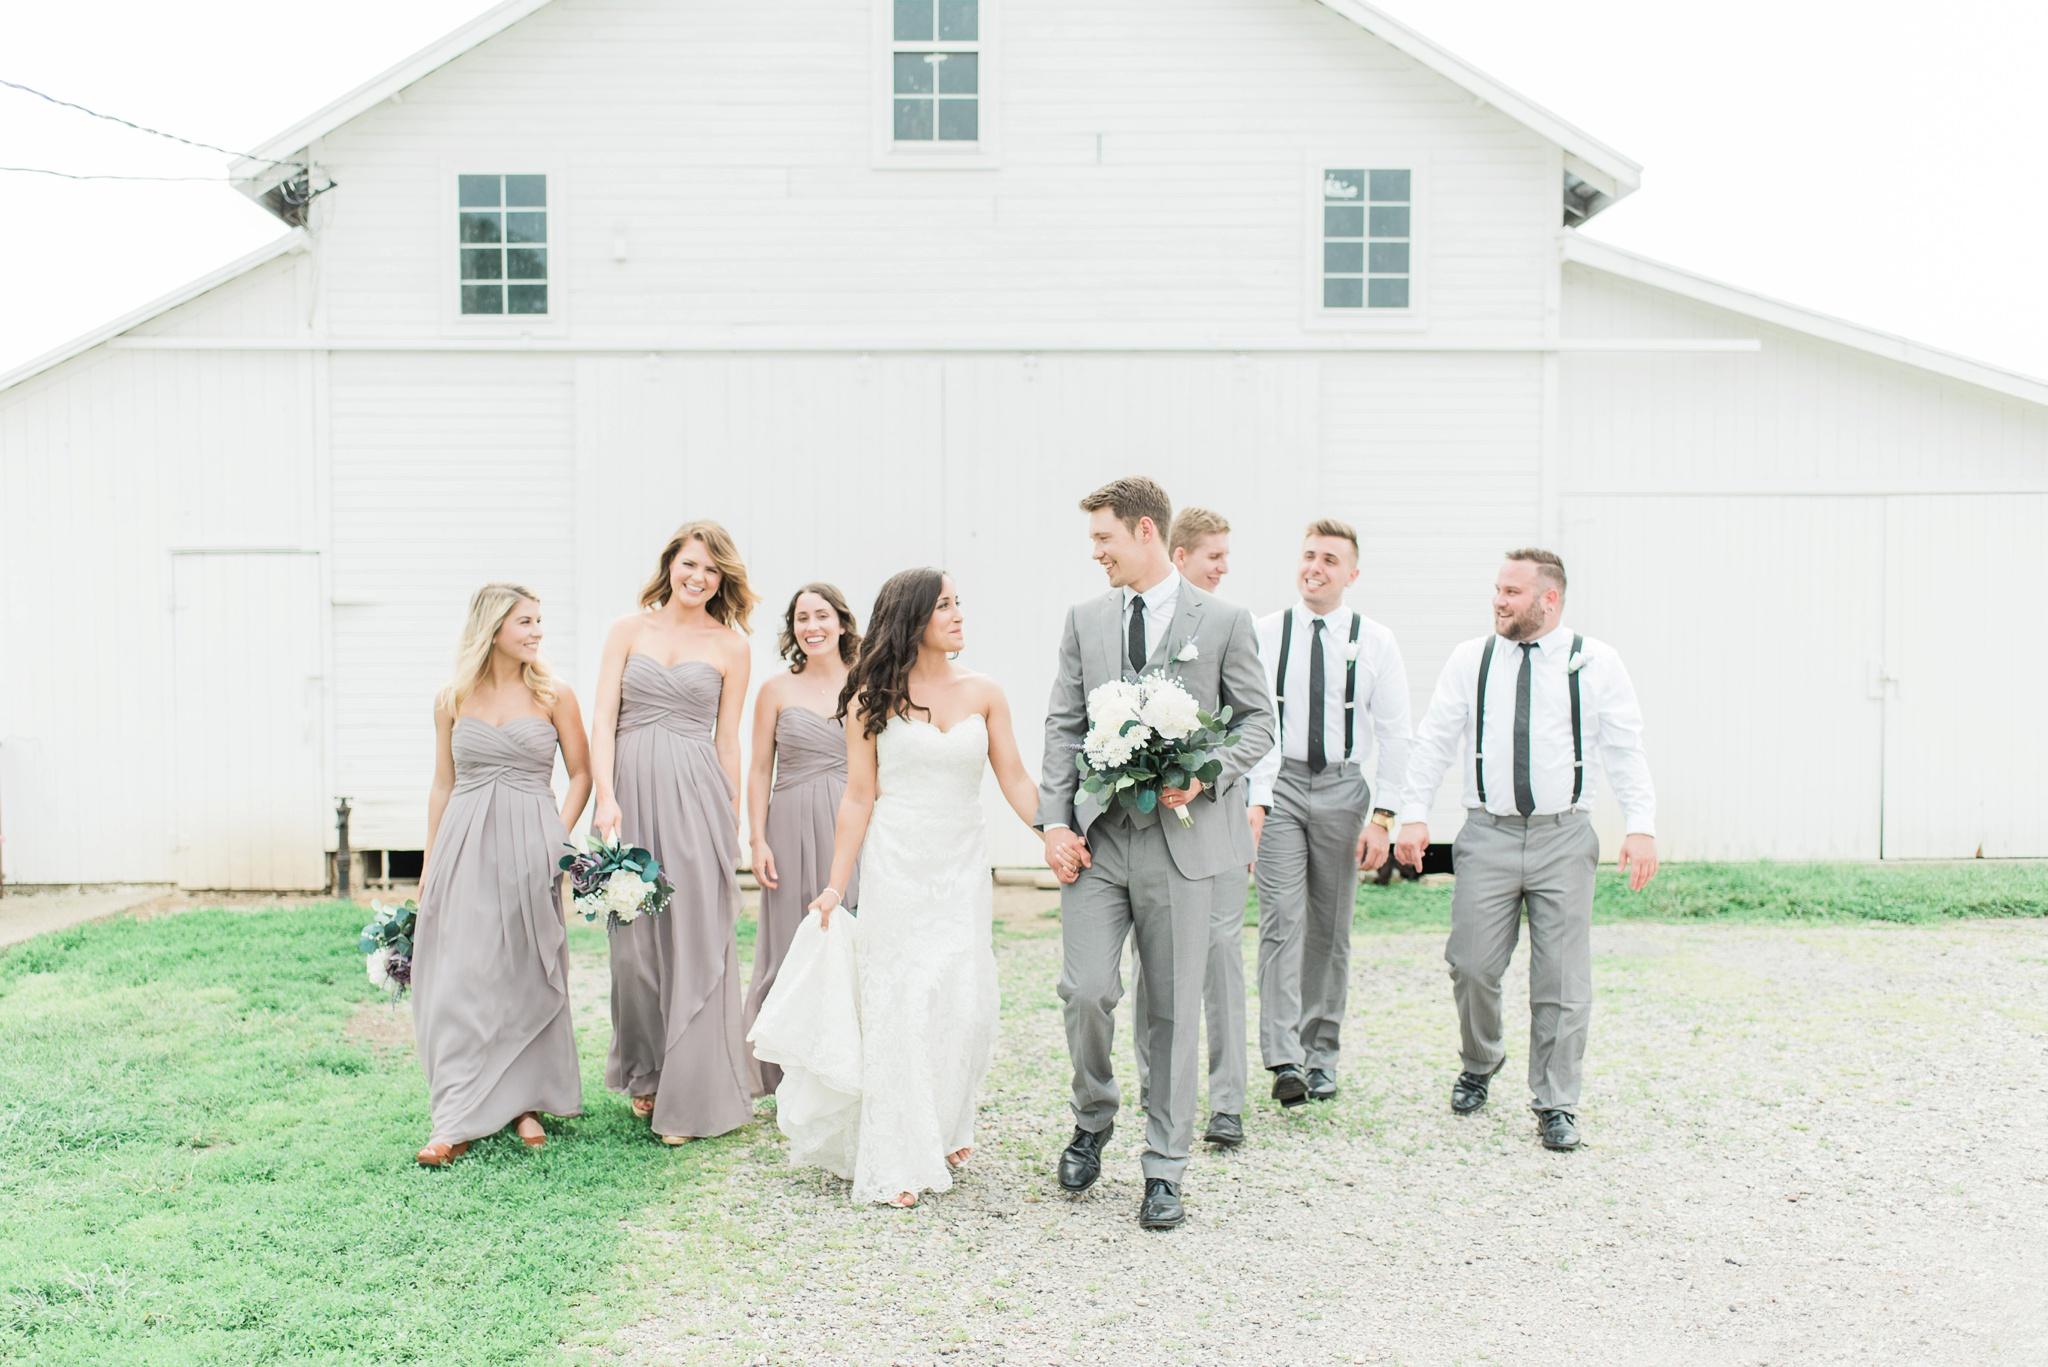 niederman-farm-wedding-cincinnati-ohio-photographer_0064.jpg